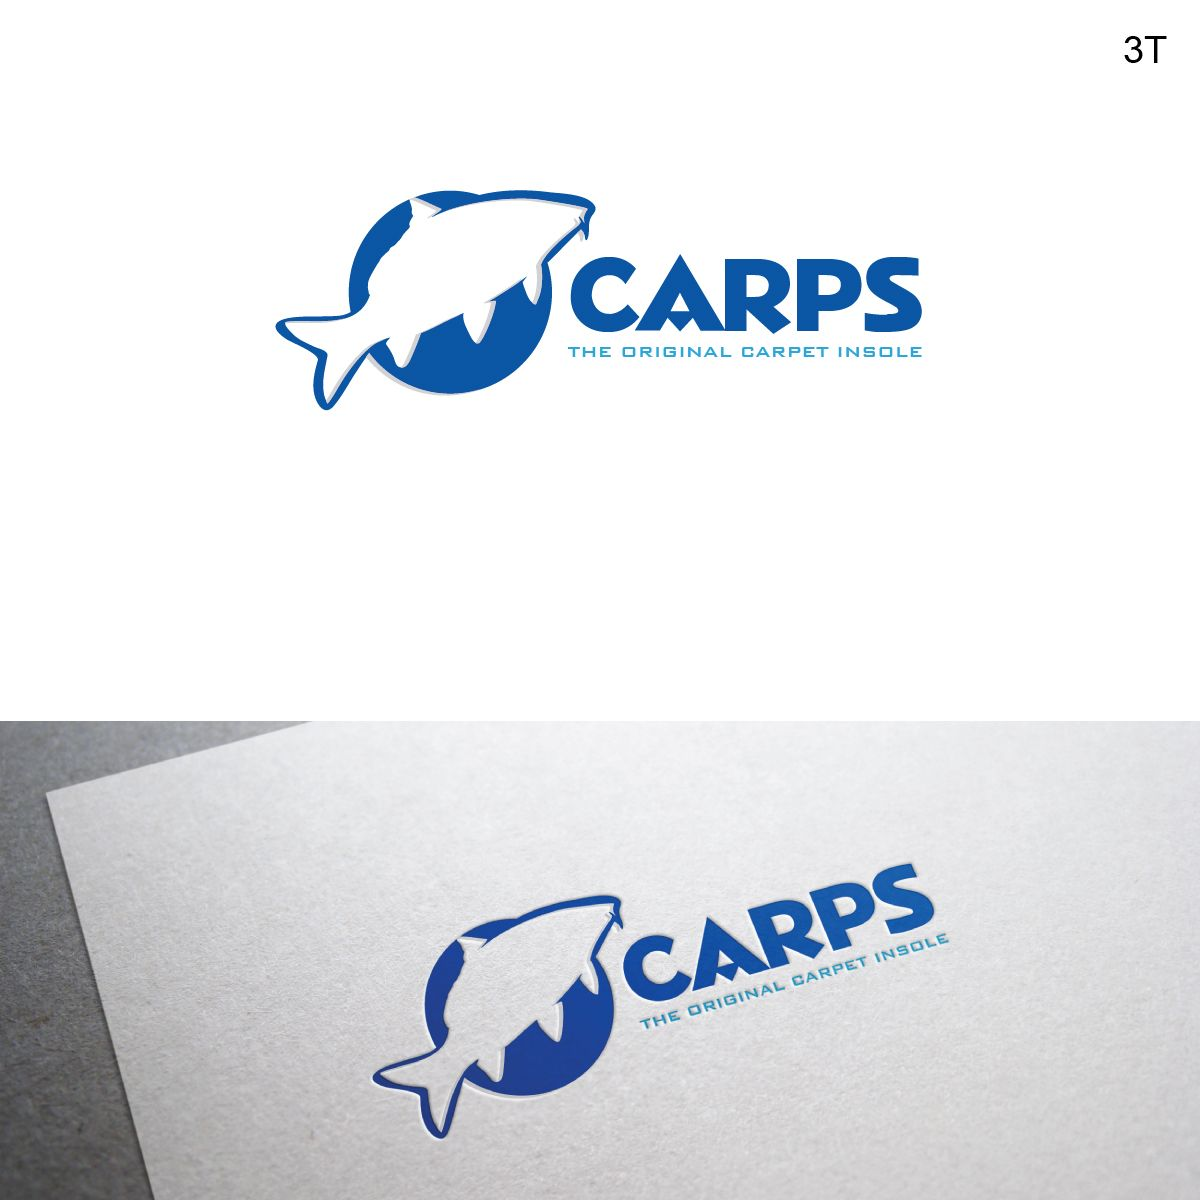 Product Logo Design - Fish Logo for use on Shoe... Elegant, Playful Logo Design by Esolbiz